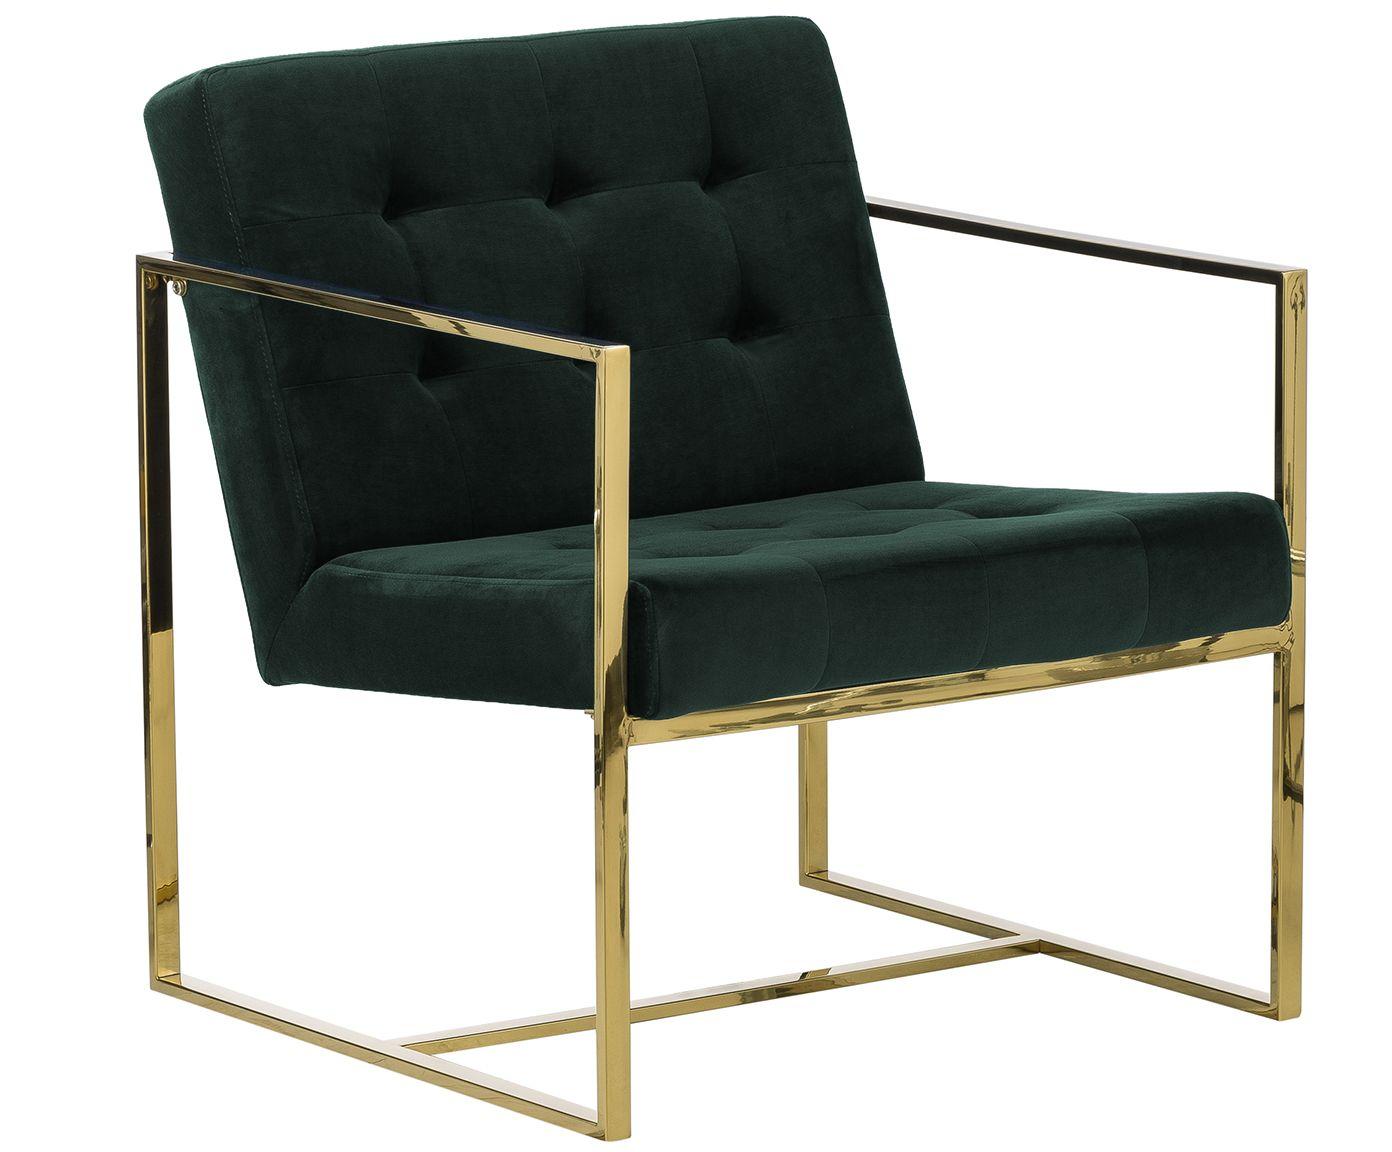 399 Samt Sessel Manhattananderson Mehr Loungesessel2 Preis 399